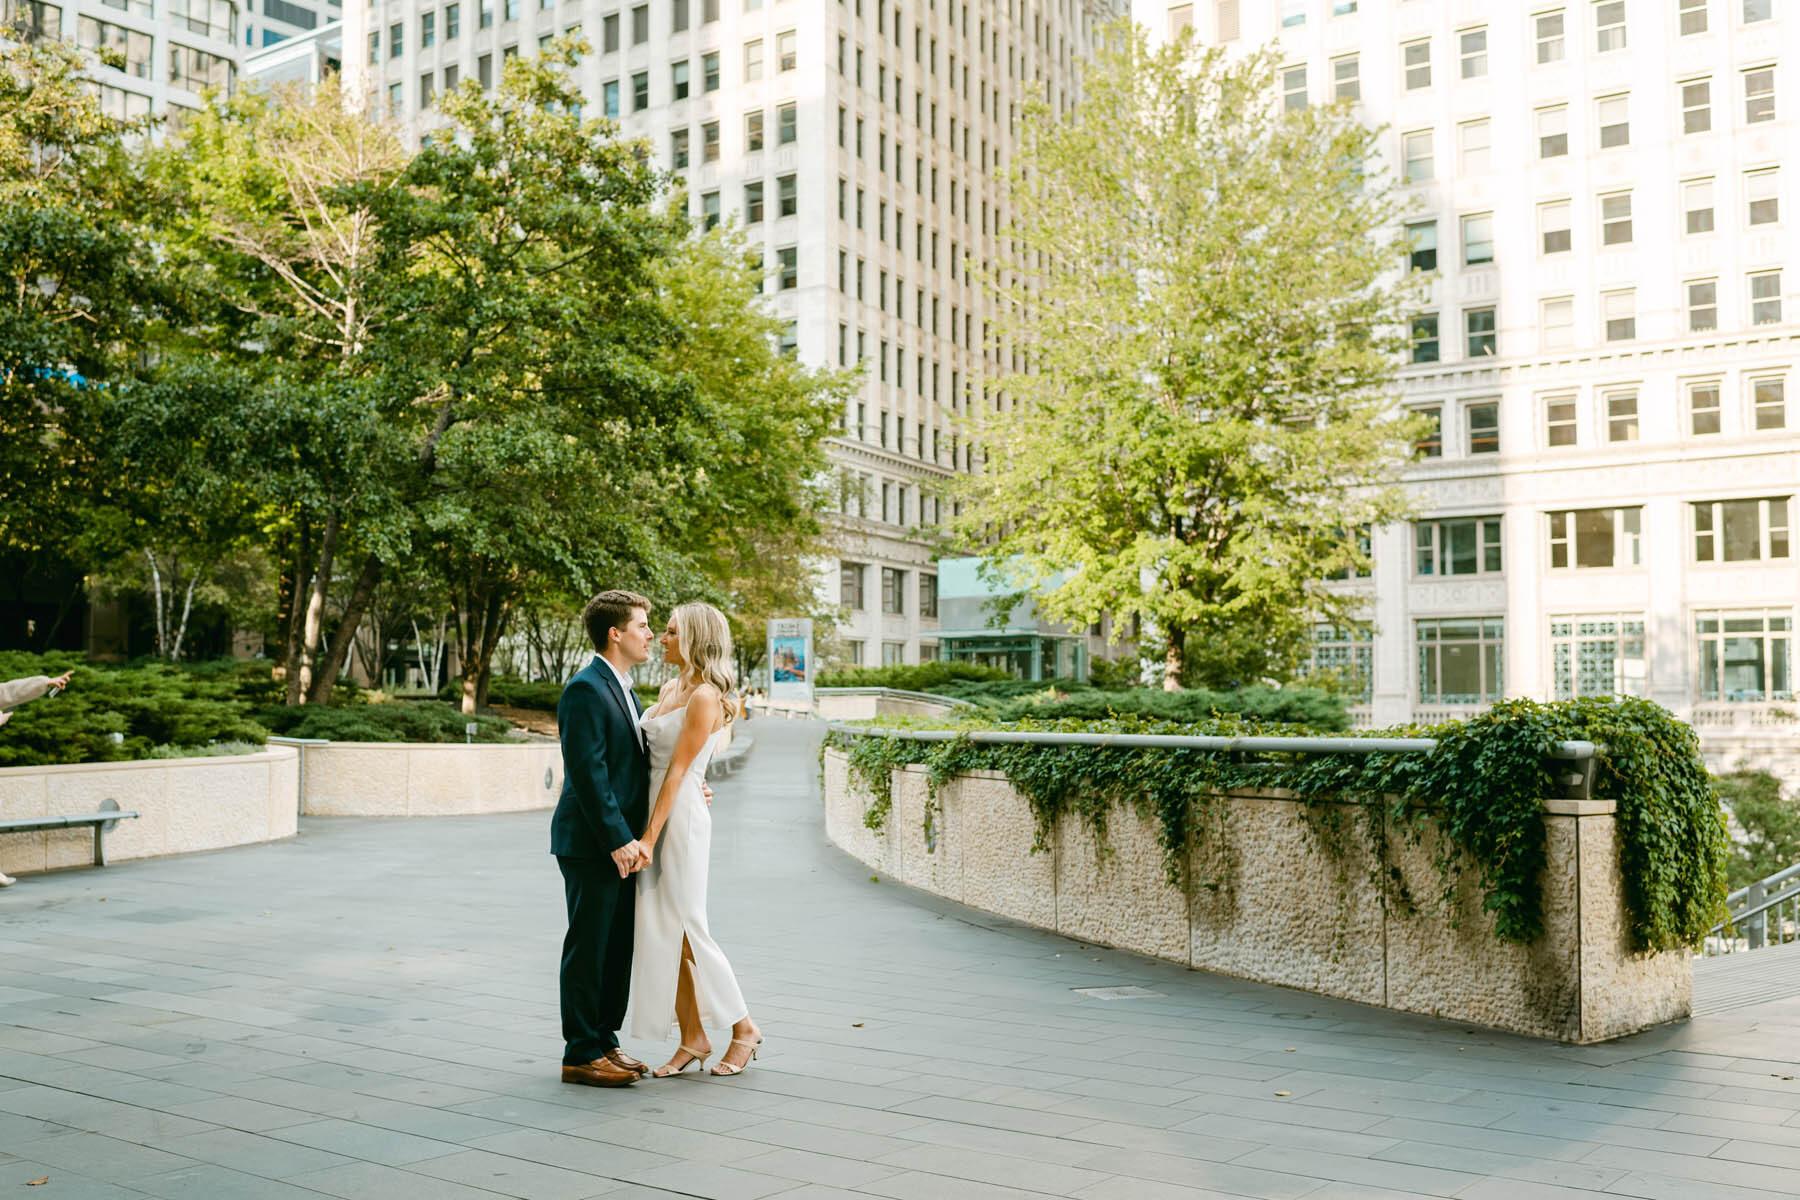 Best Chicago Engagement Location